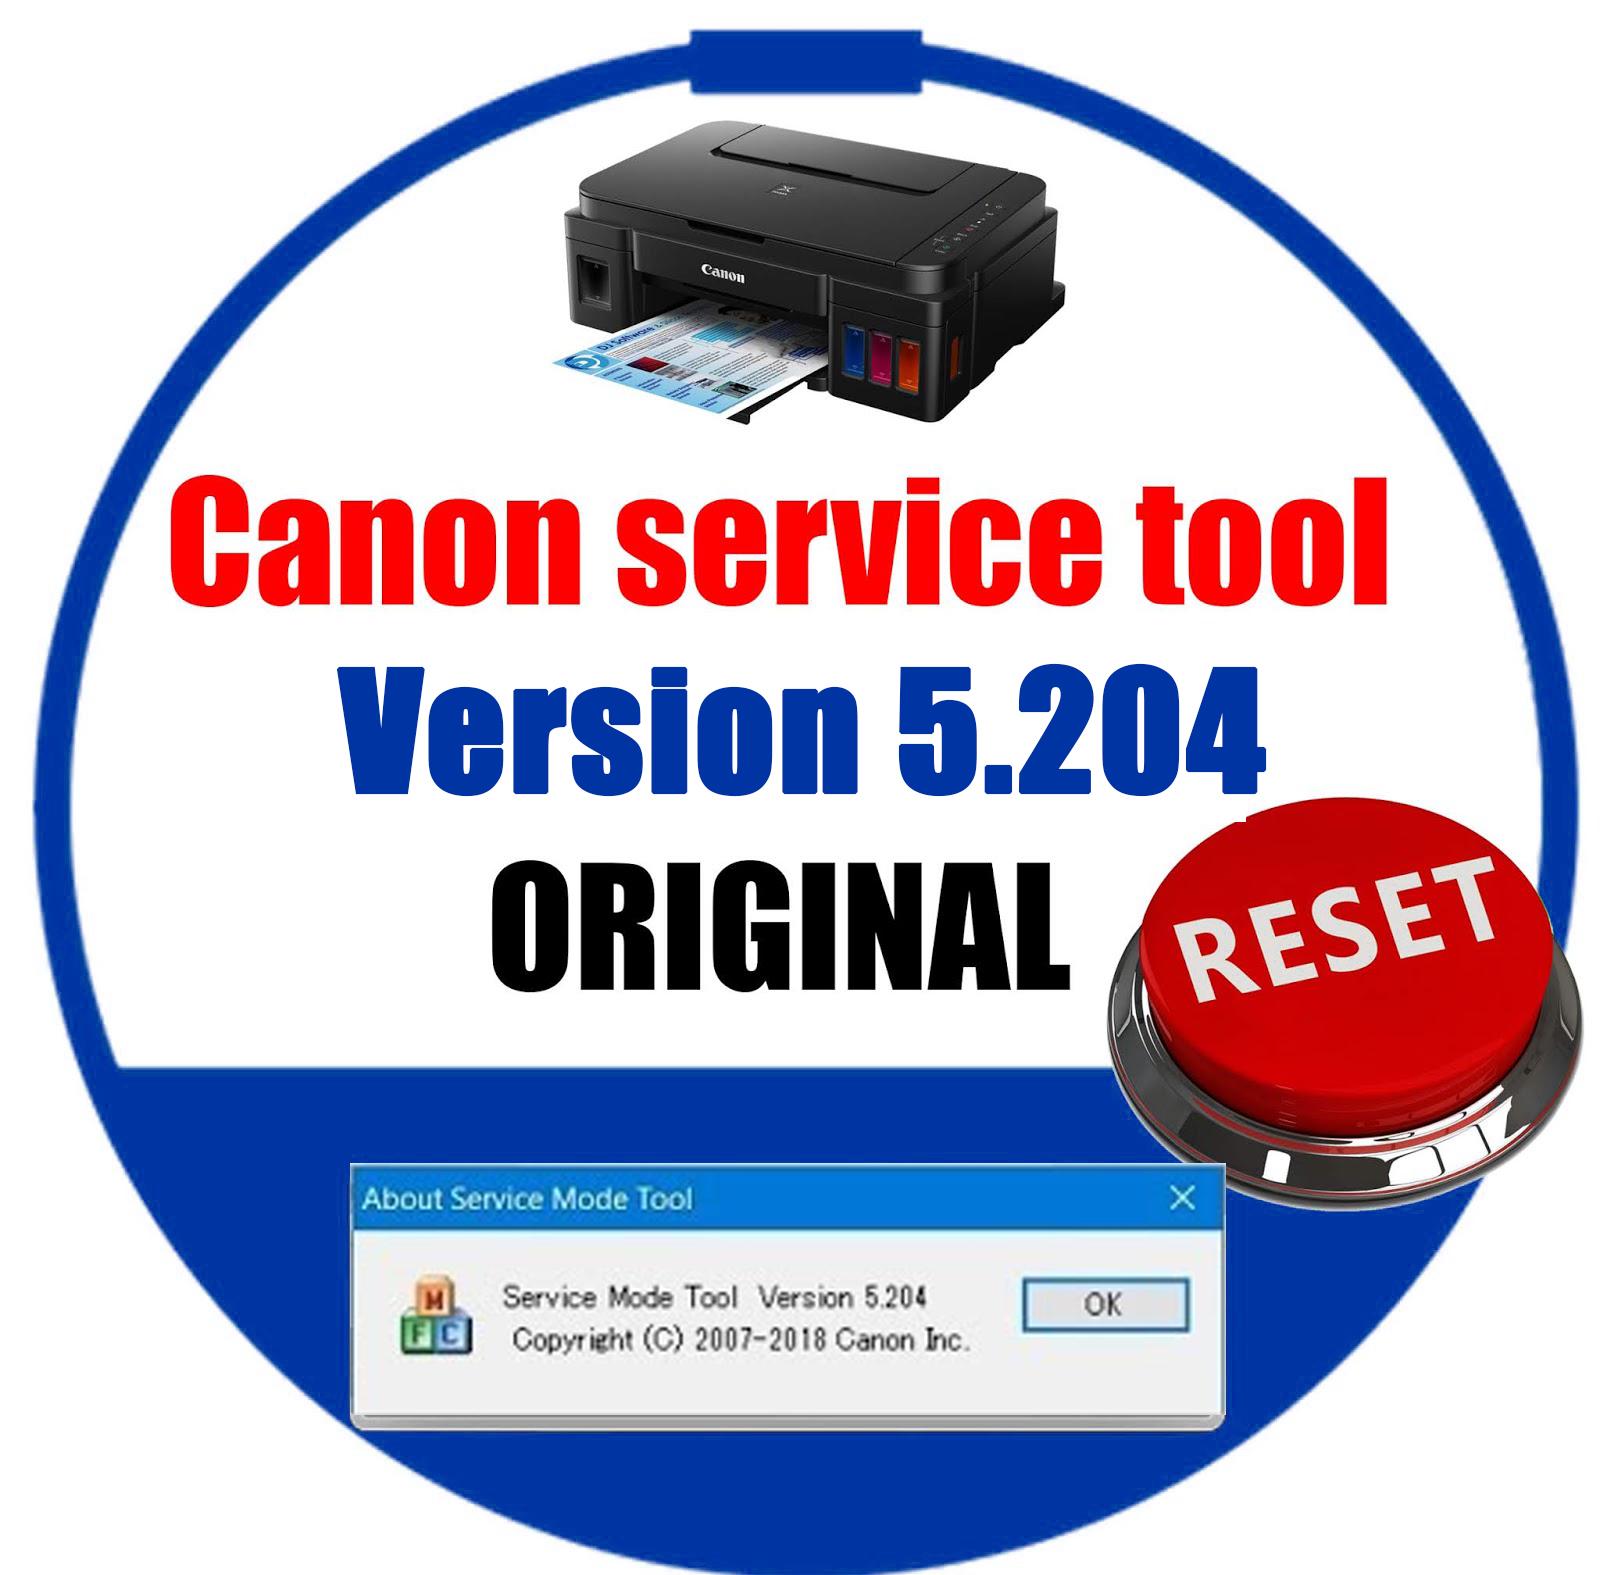 canon service tool v5204 | PRINTER RESET SOLUTION